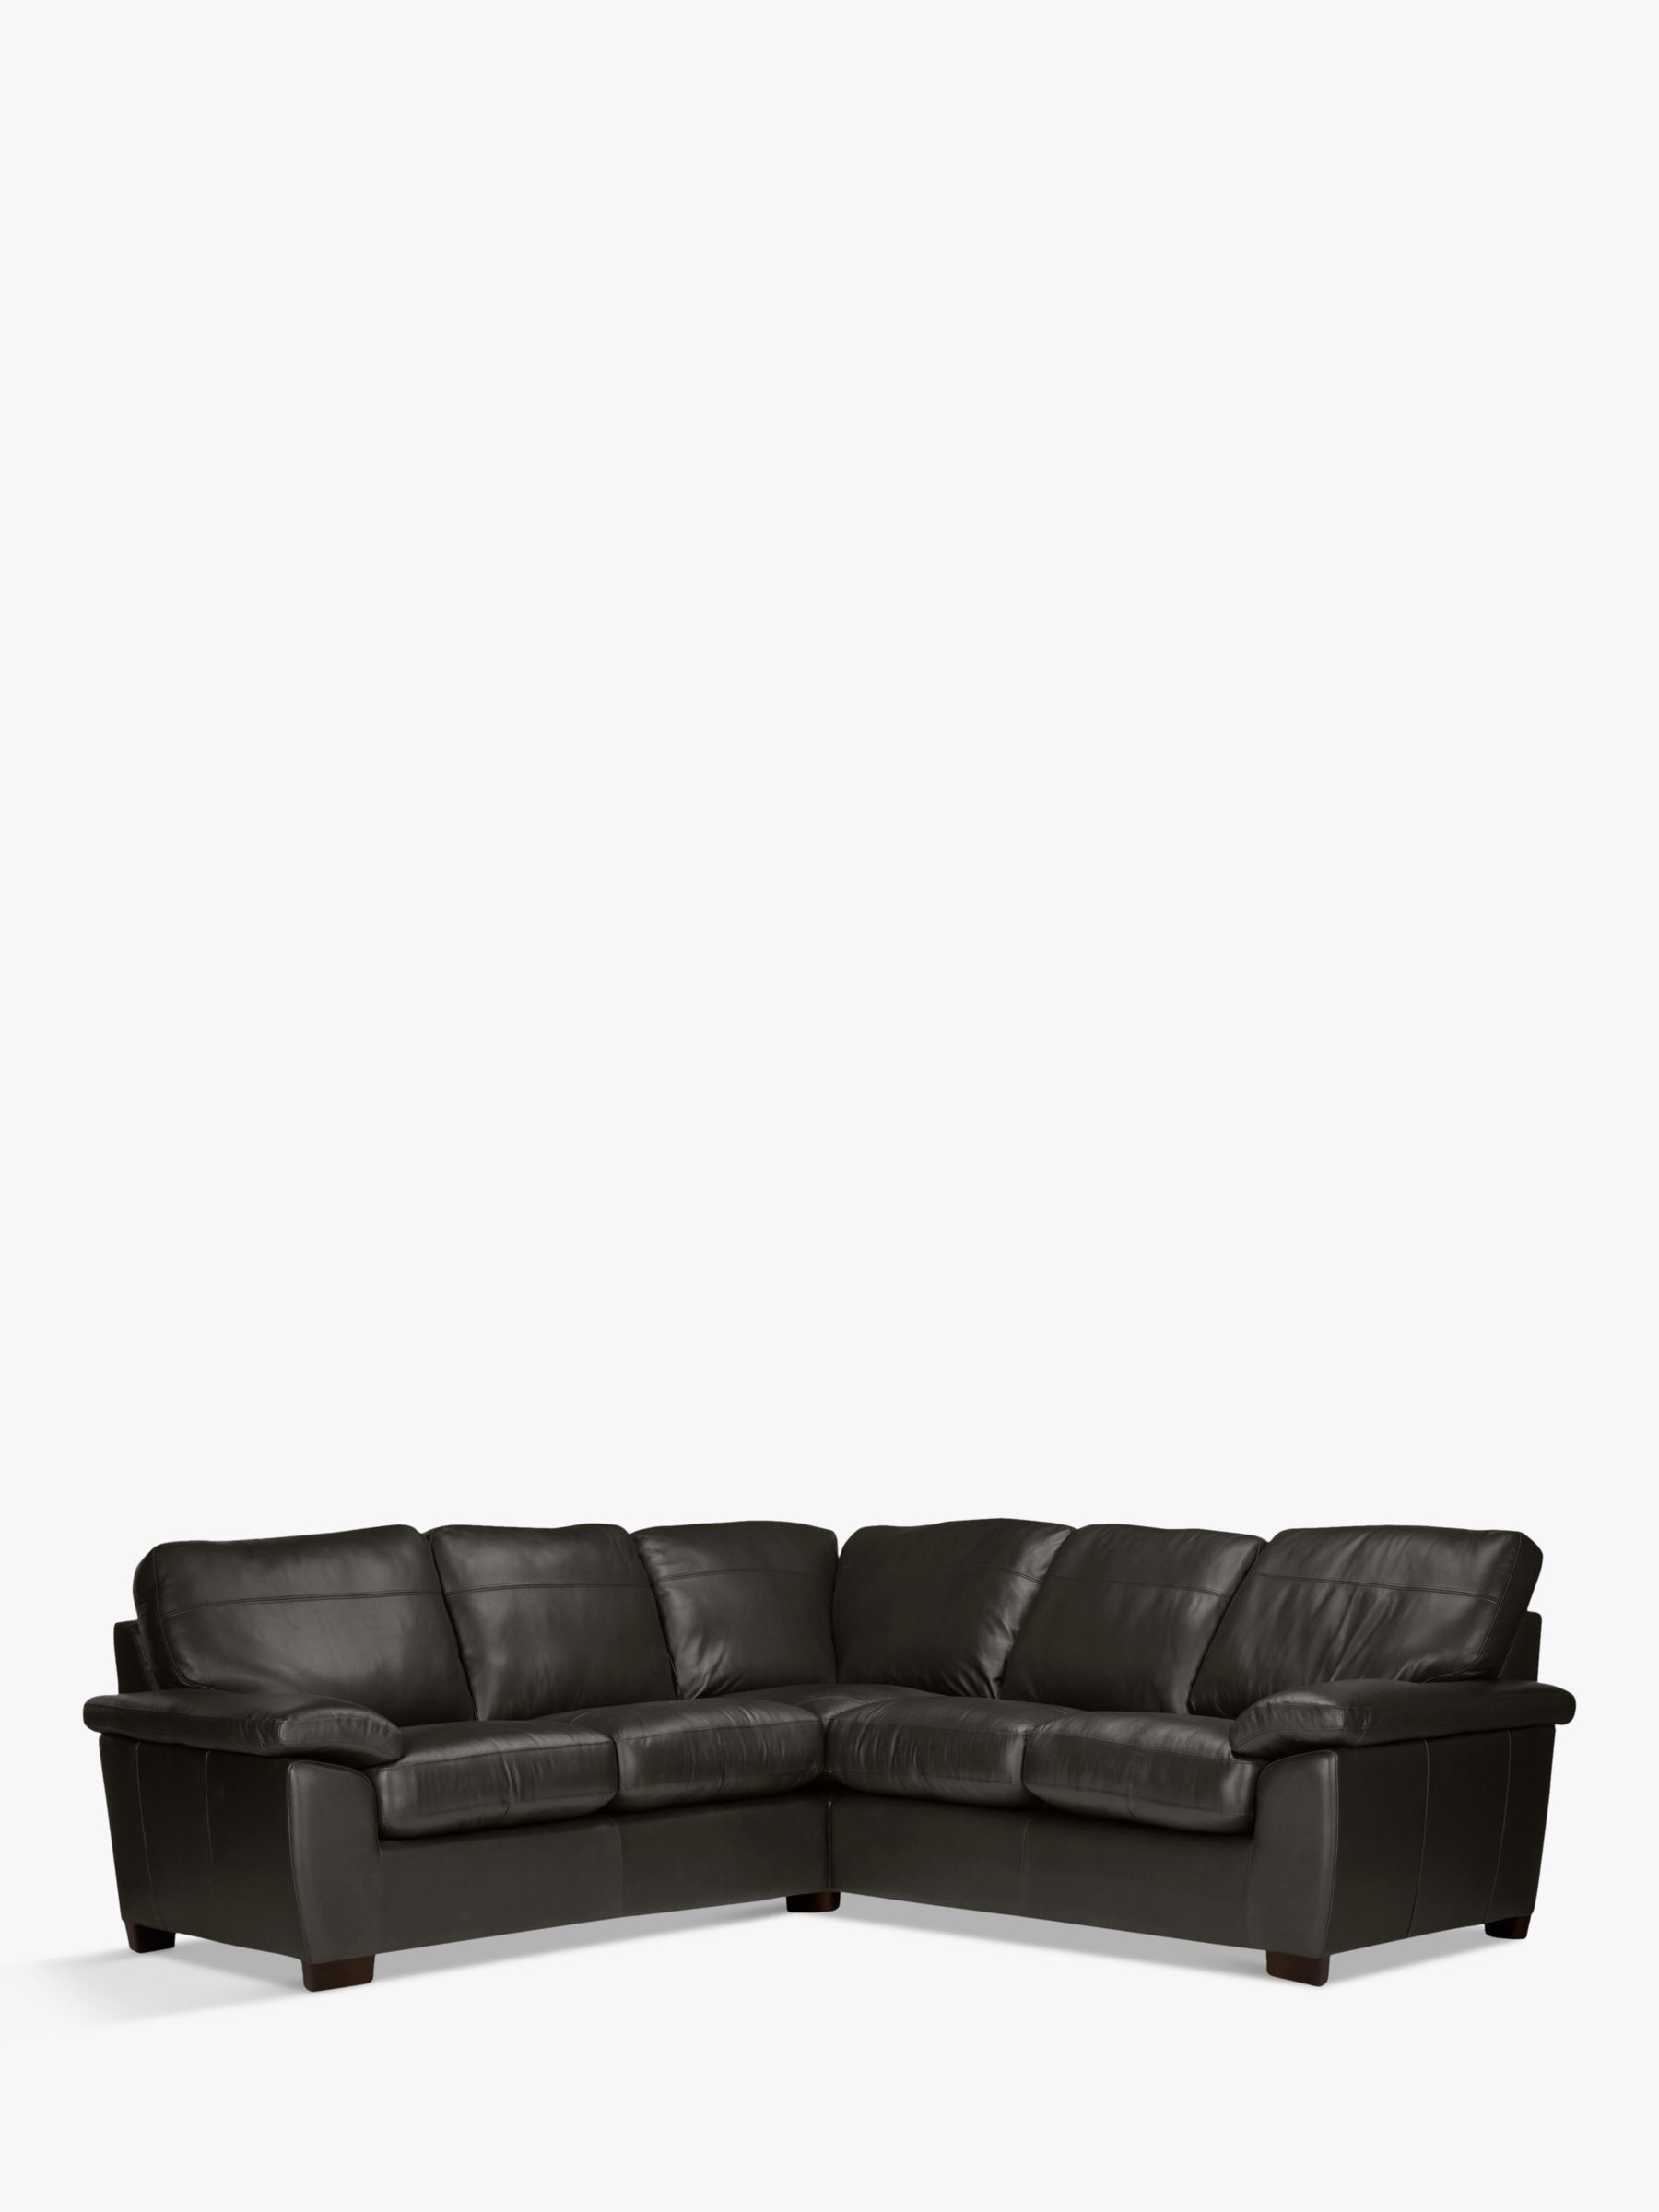 John Lewis Partners Camden Leather Corner Sofa Dark Leg Leather Corner Sofa Sofa Corner Sofa